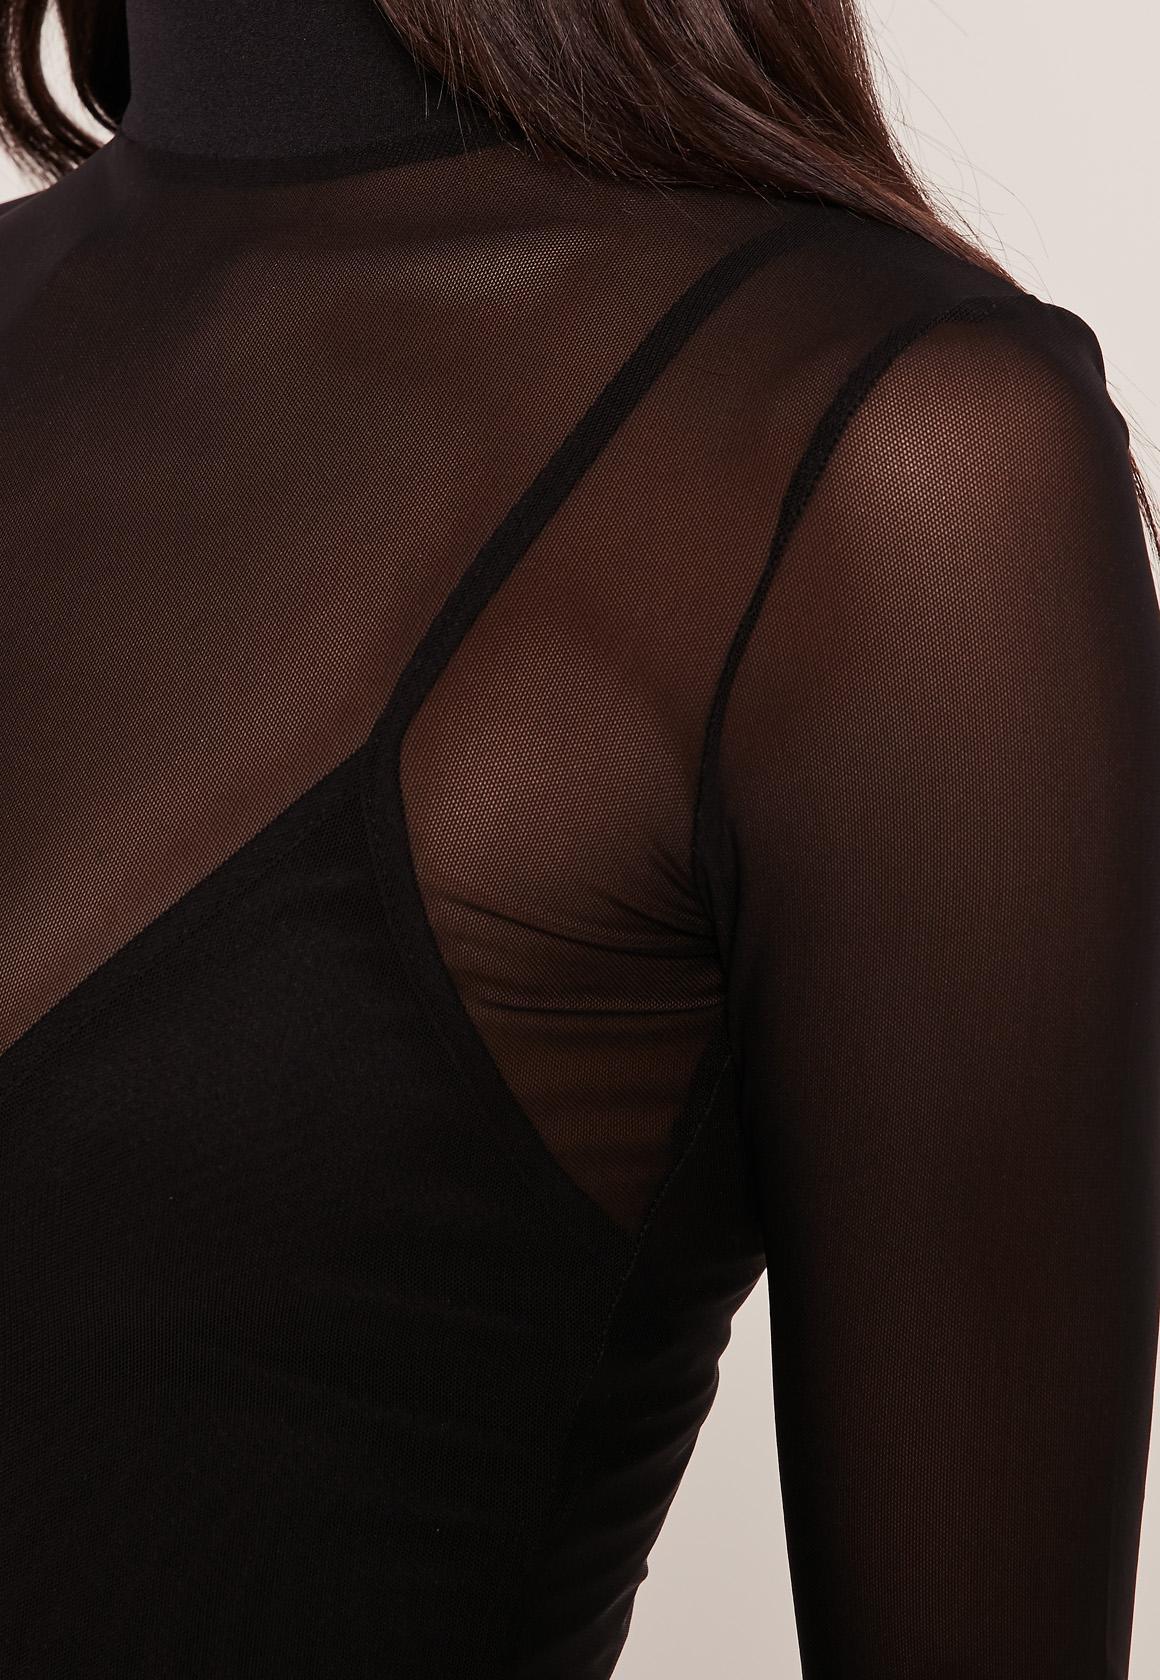 Black High Neck Mesh Overlay Dress